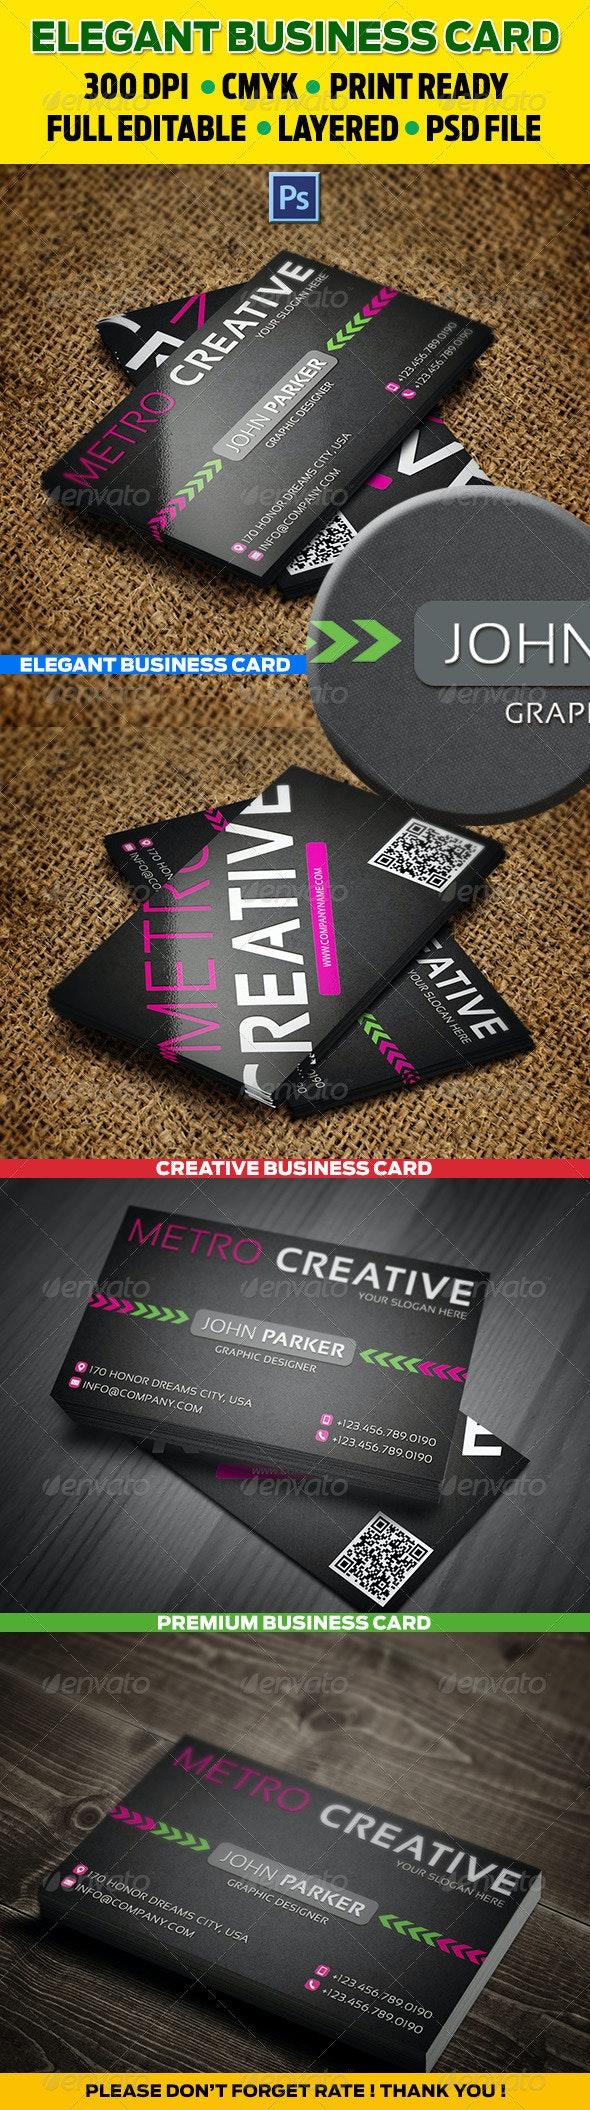 Creative Business Cards 27 - Creative Business Cards